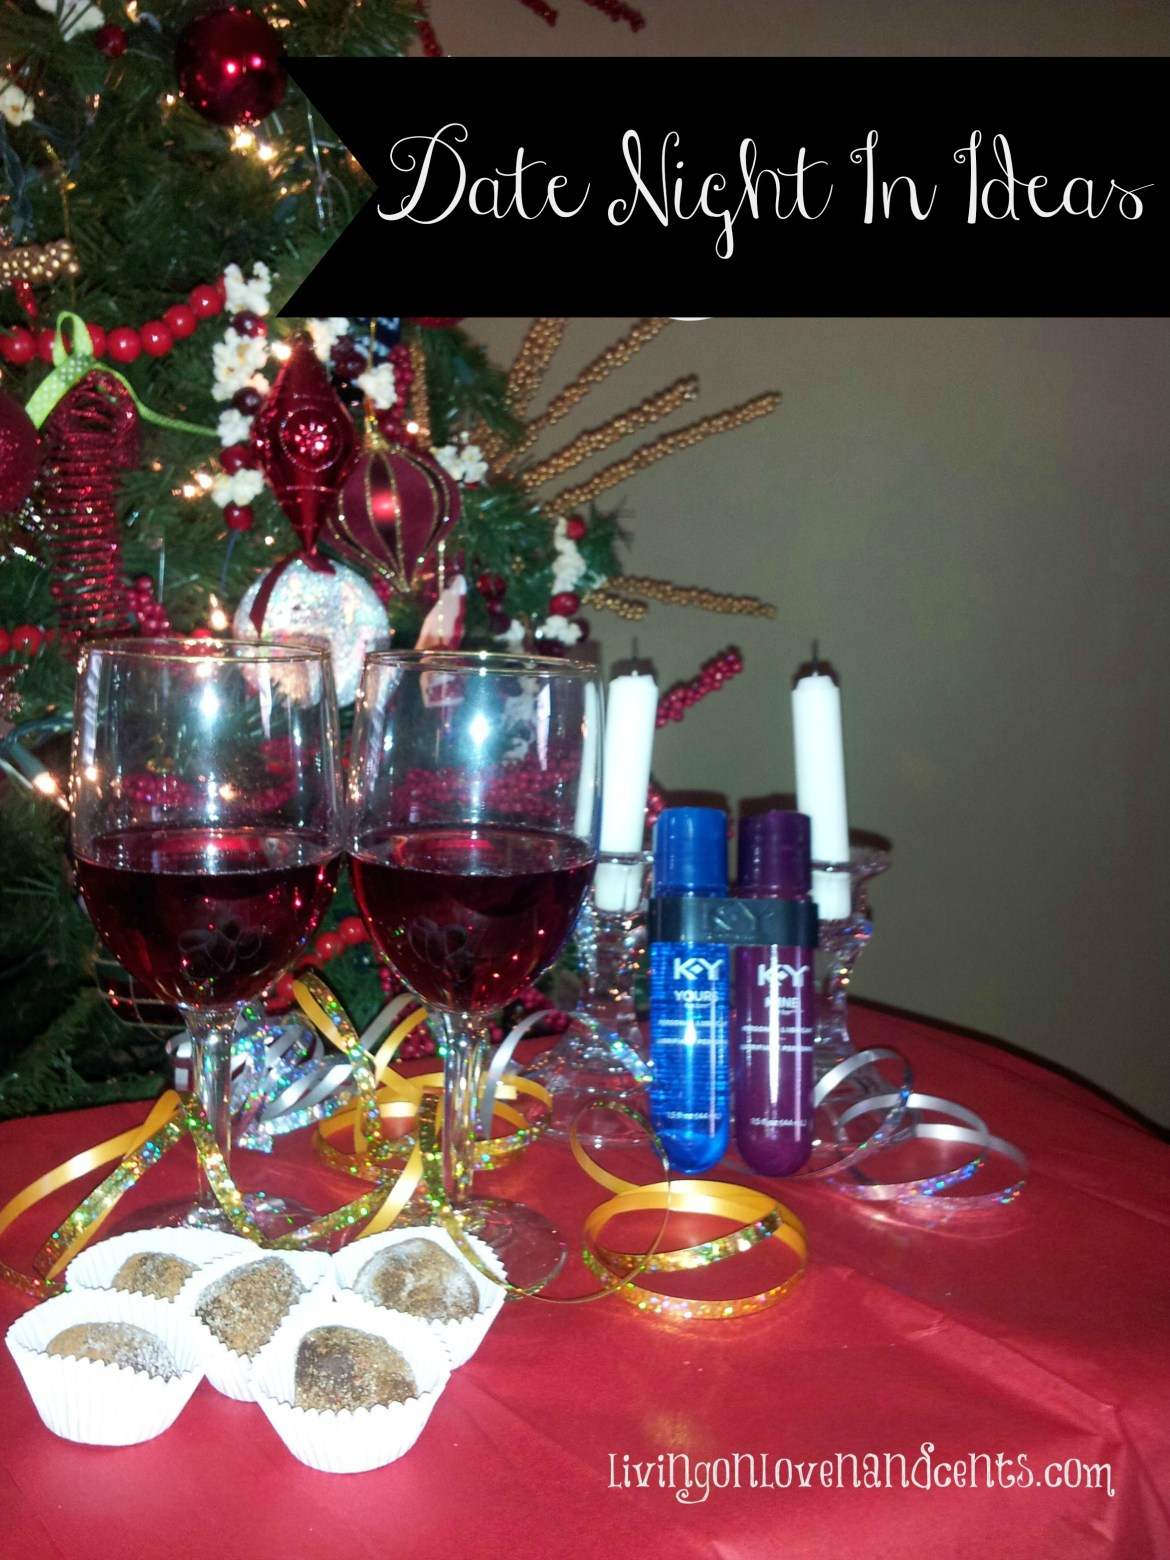 Date night, Date night in, Date idea, Intimacy, Intimacy enhancement, Couples lubricants, Personal lubricants, #shop, #cbias #KYdatenight